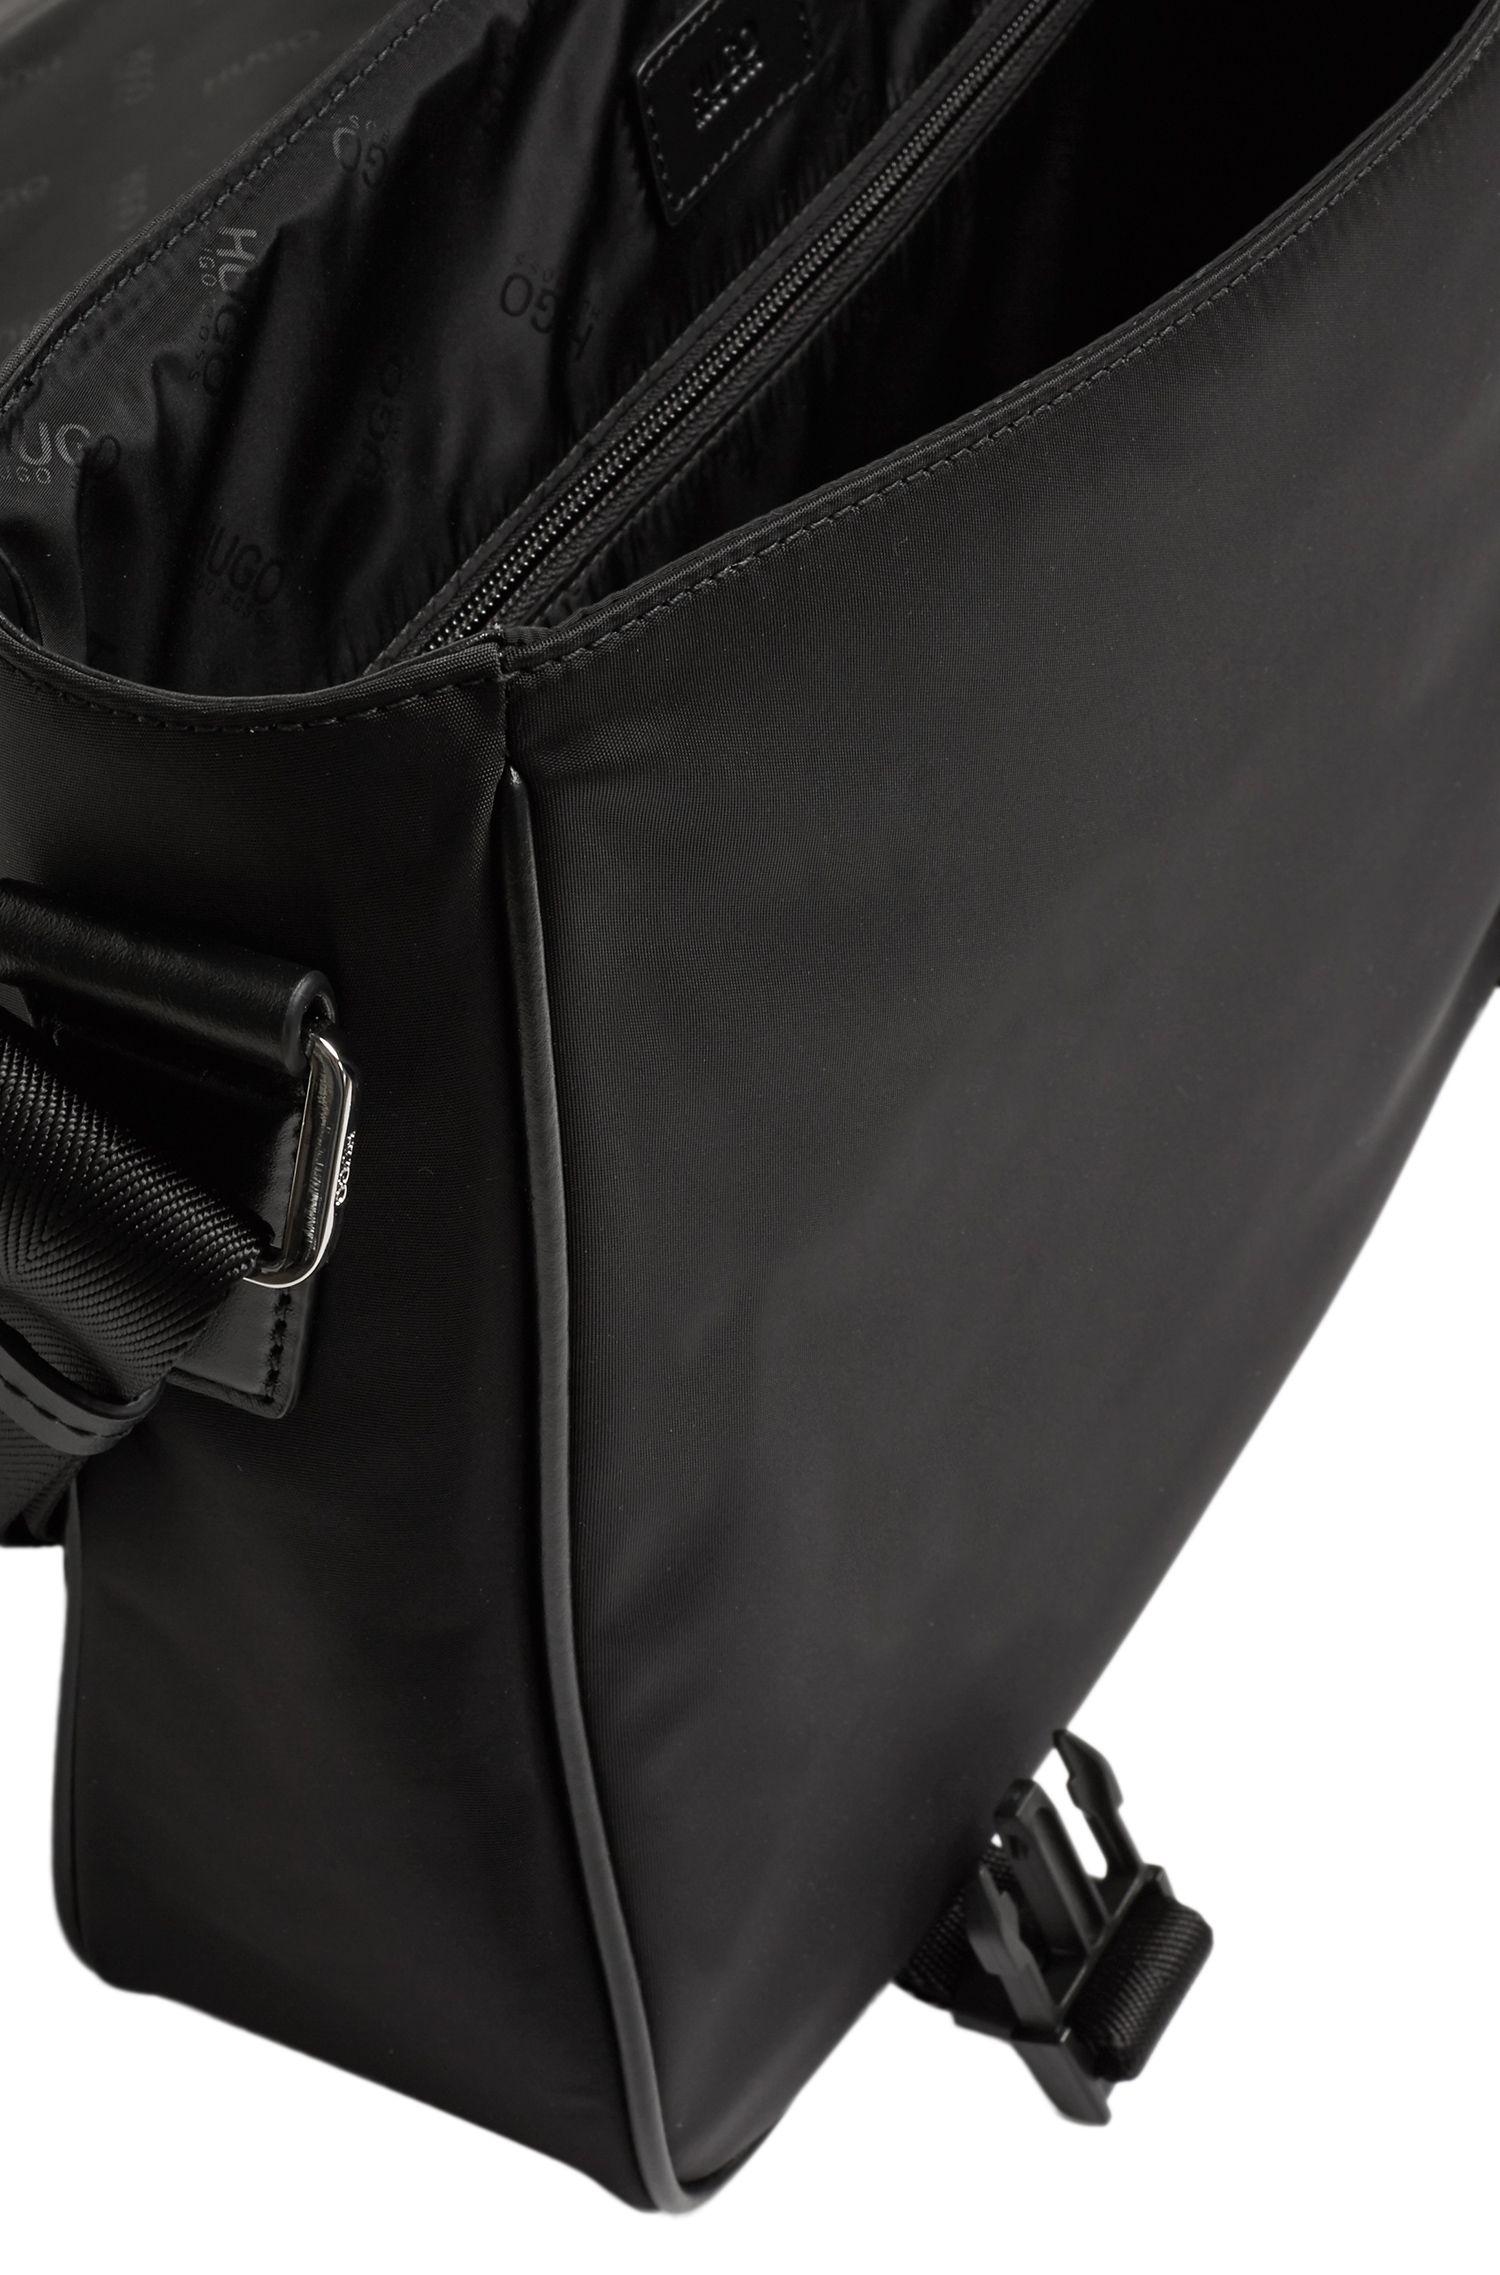 Umhängetasche mit Leder-Paspeln: 'Digital L_Mess_flap'